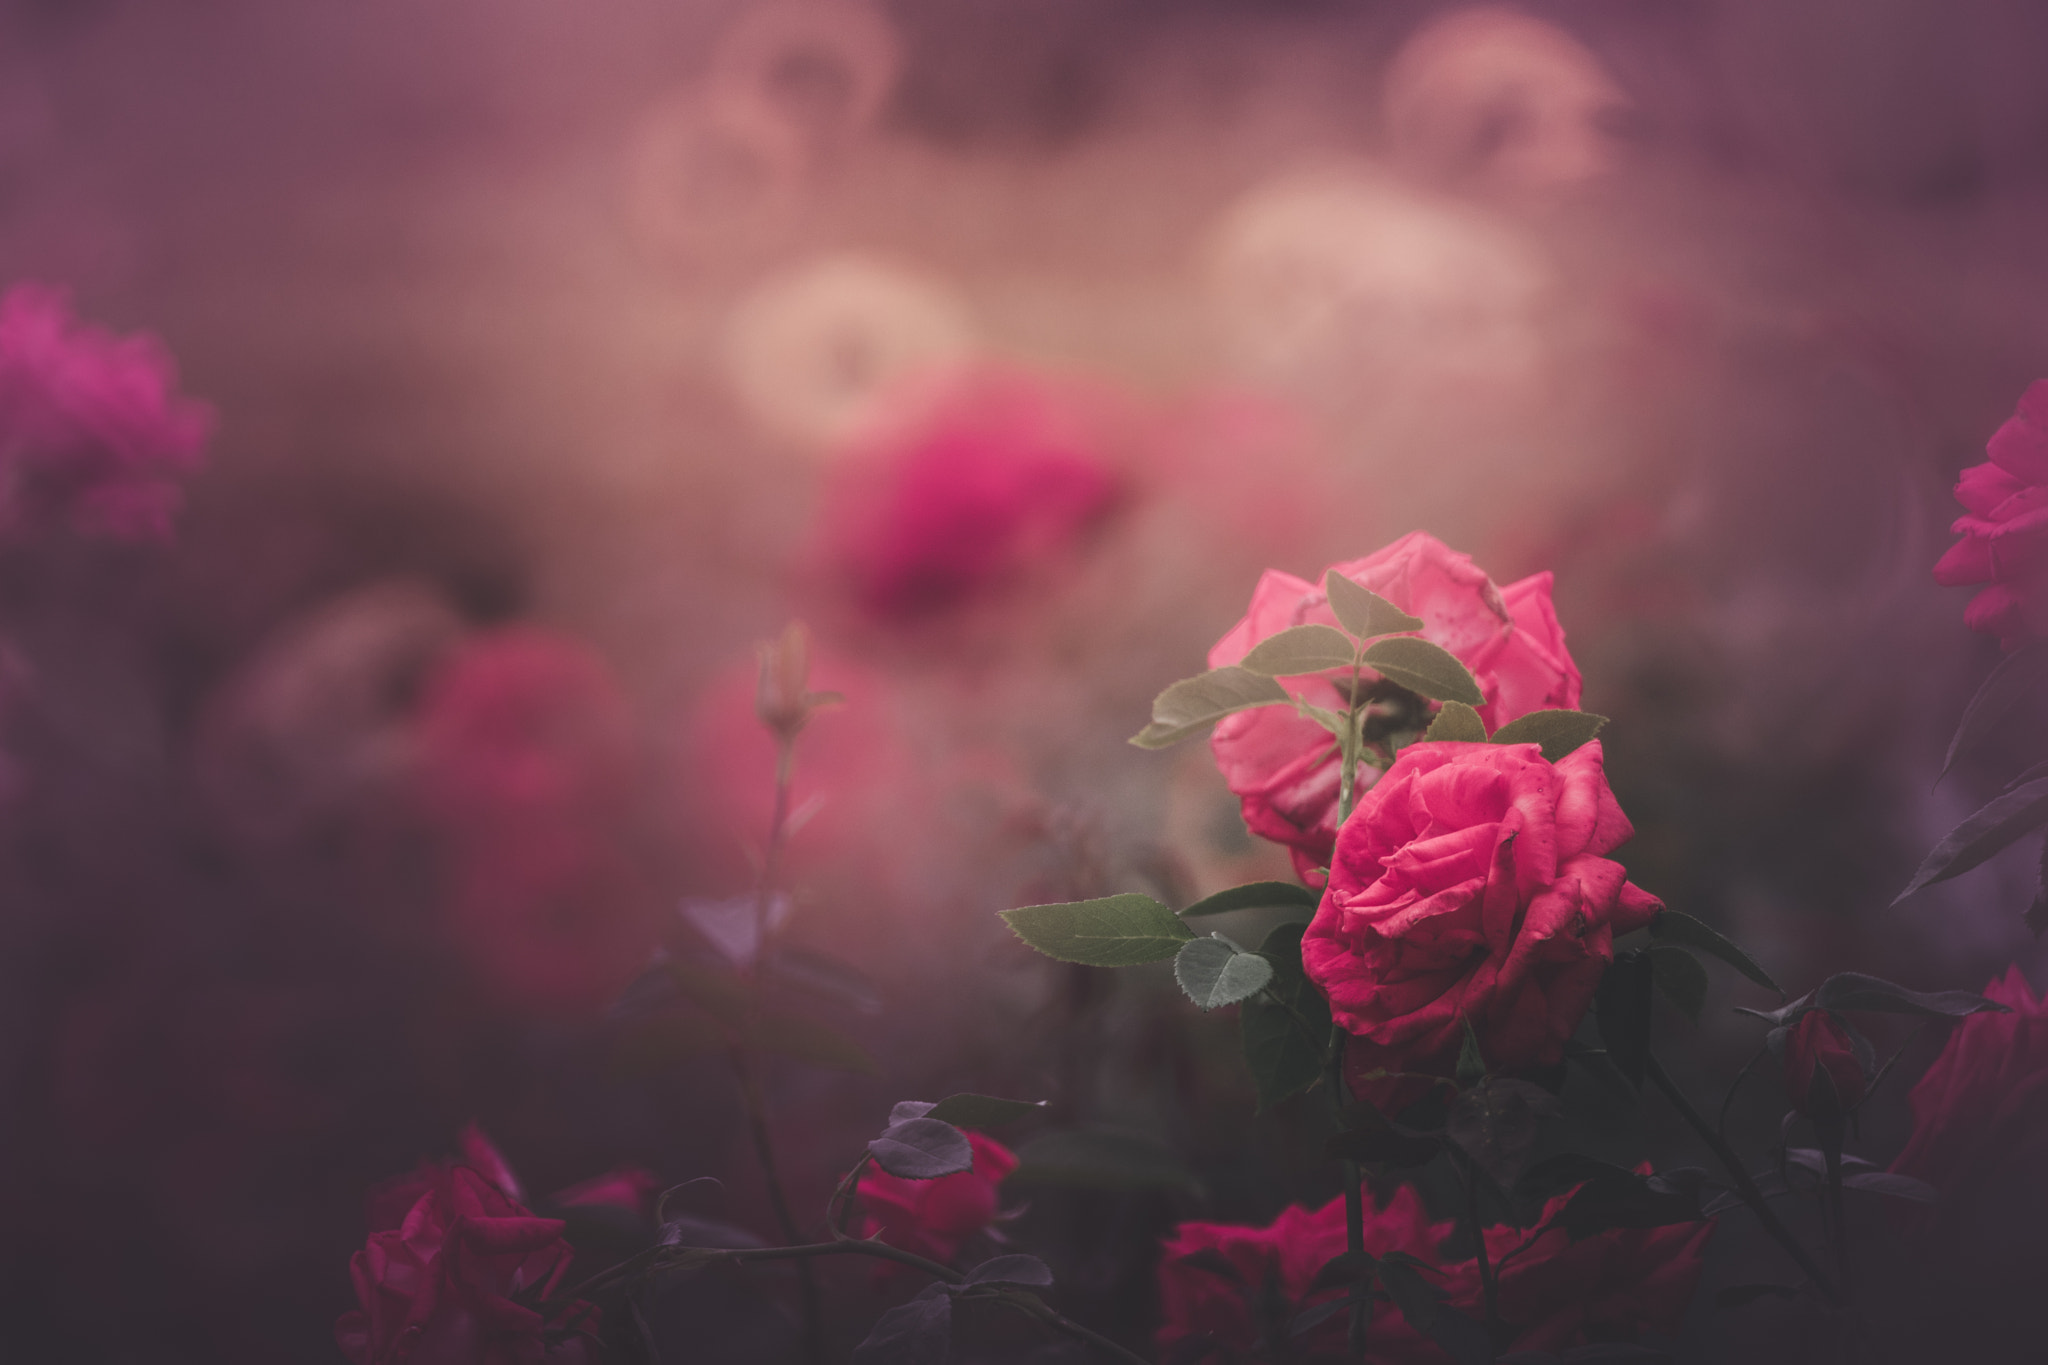 Фото Розовые розы на размытом фоне, by kazumi n